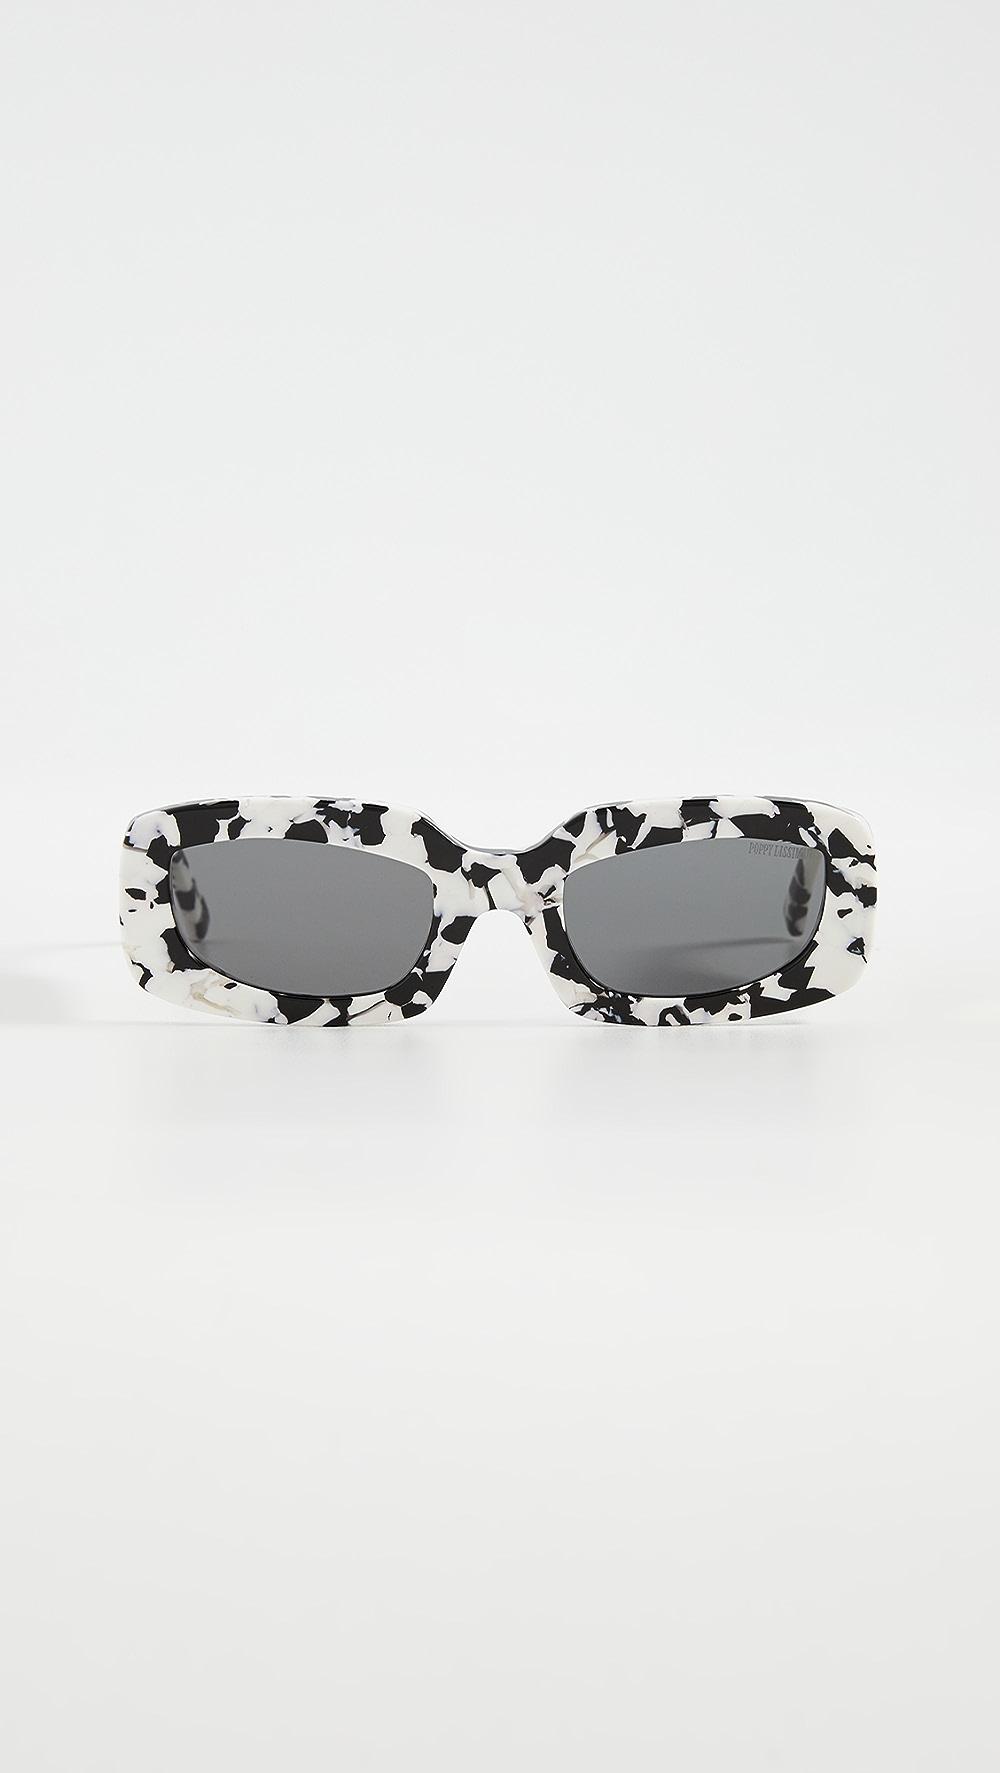 Poppy Lissiman Eyewear